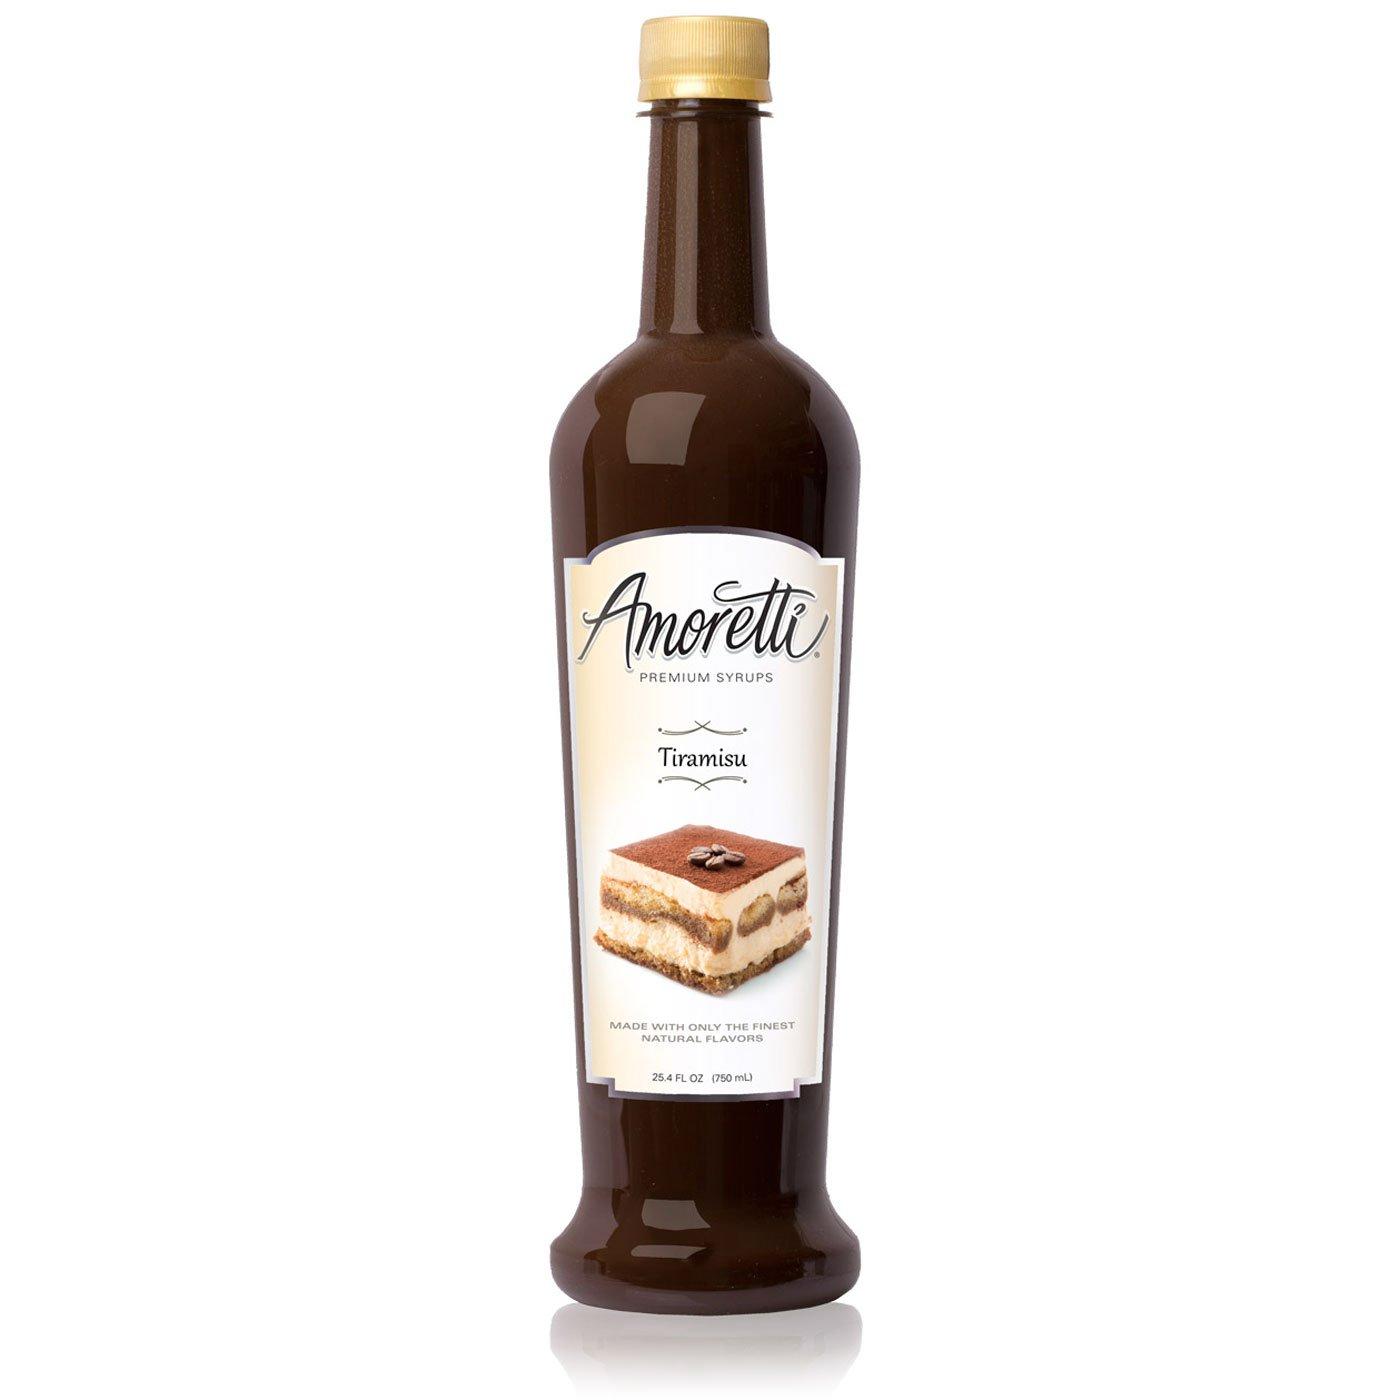 Amoretti Premium Syrup, Tiramisu, 25.4 Ounce